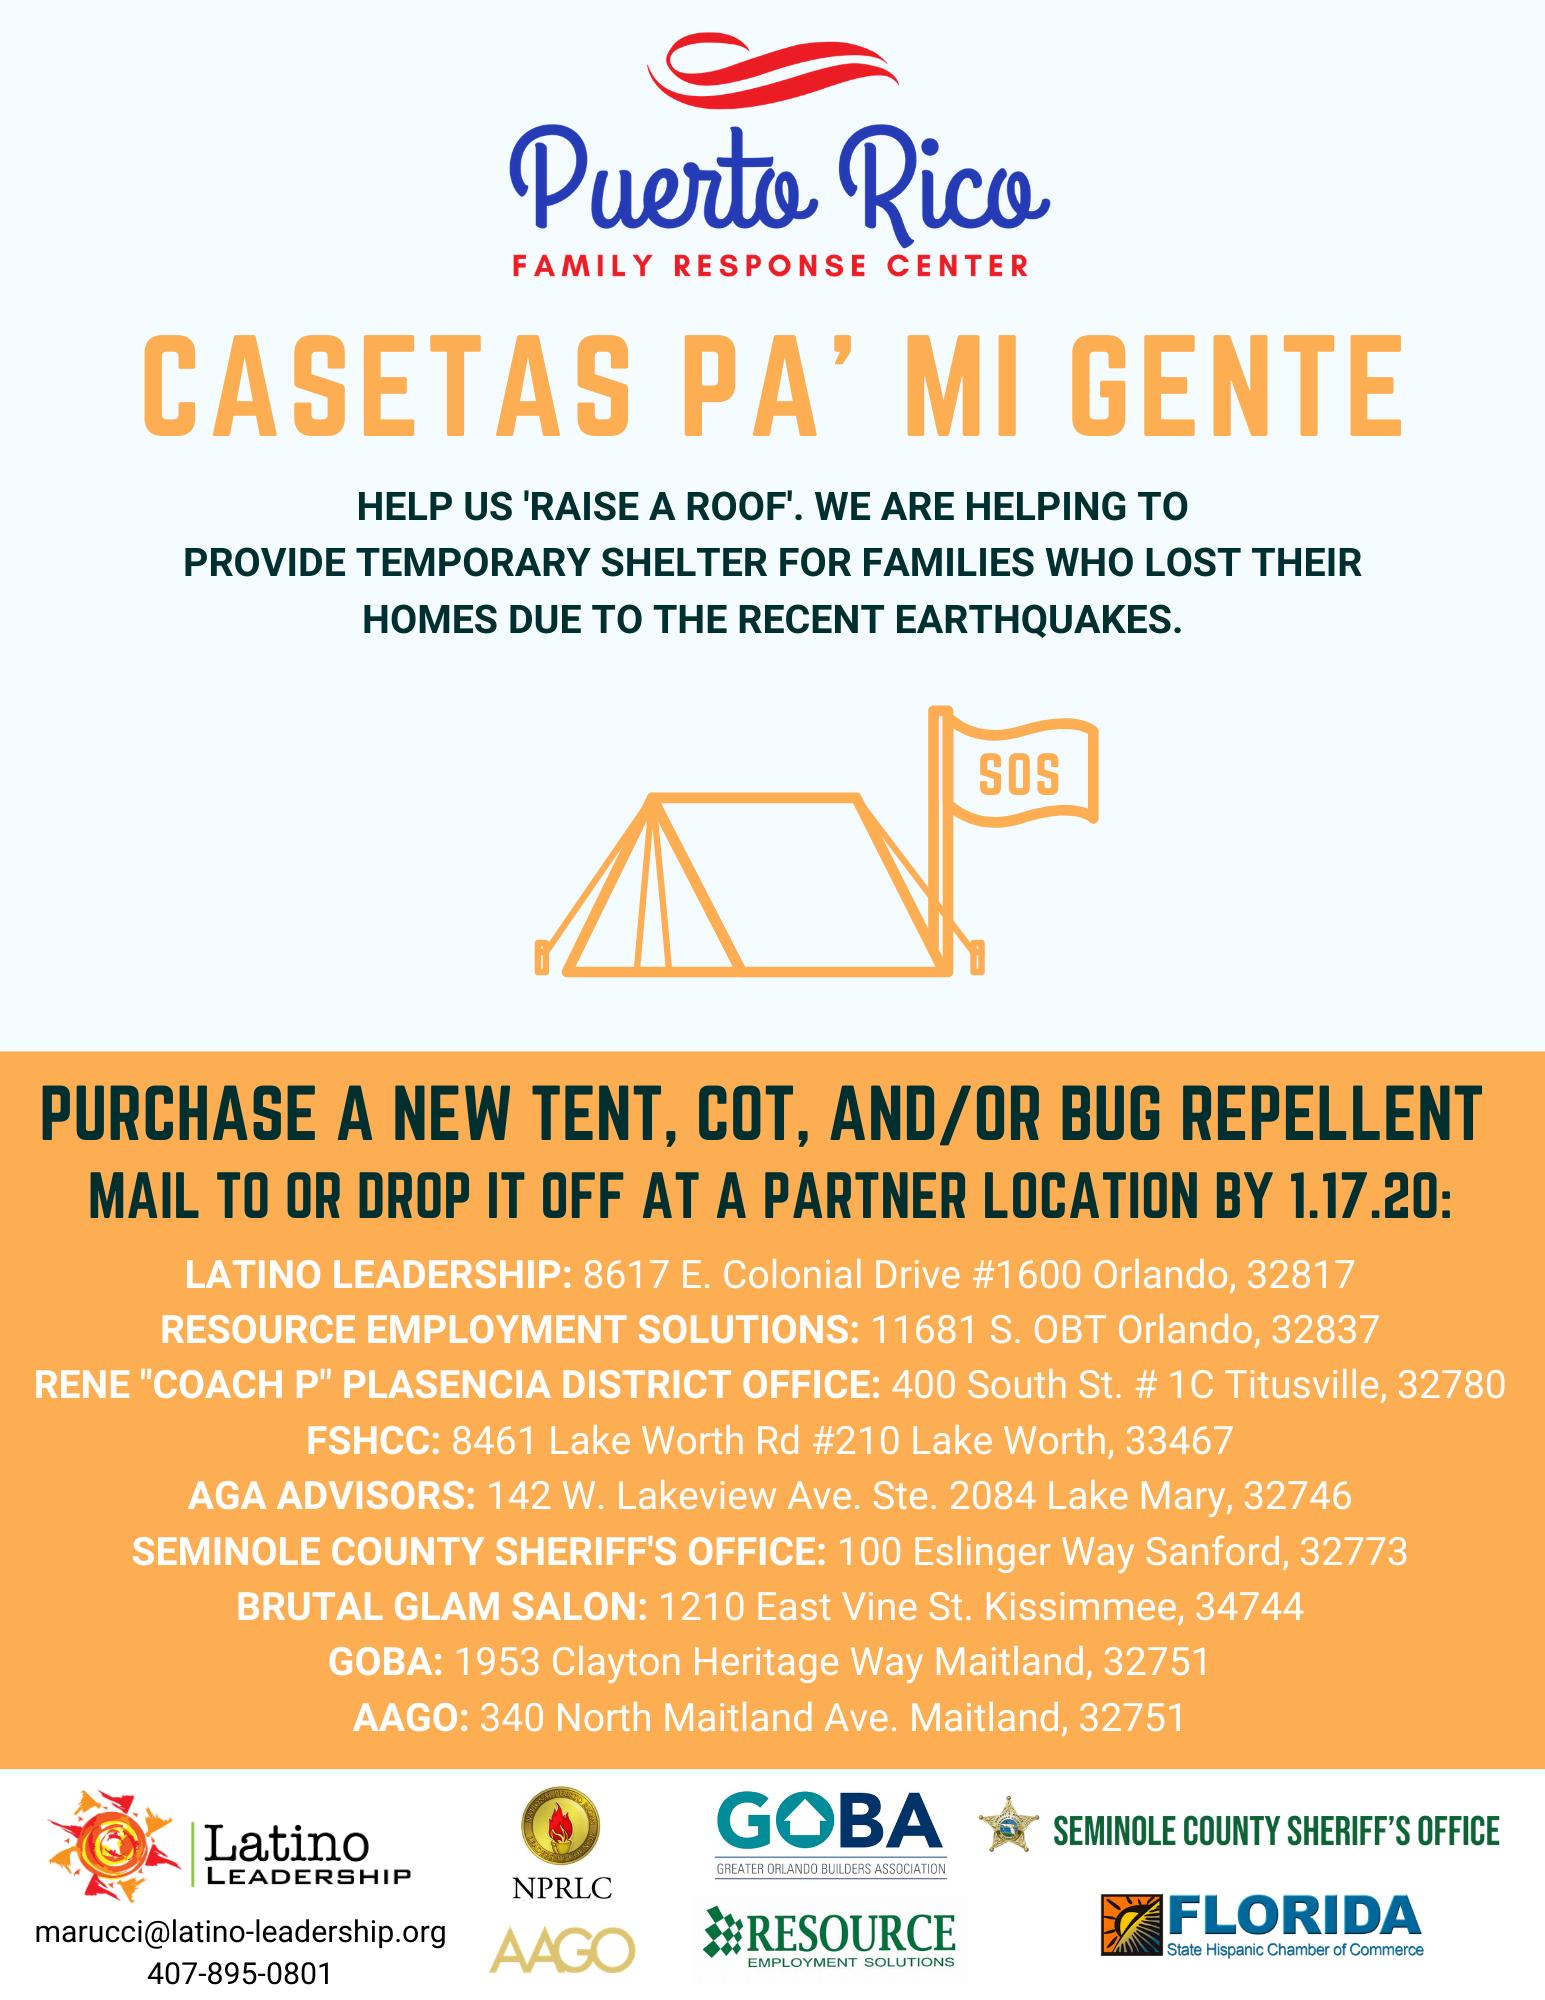 Flyer describing donations needed